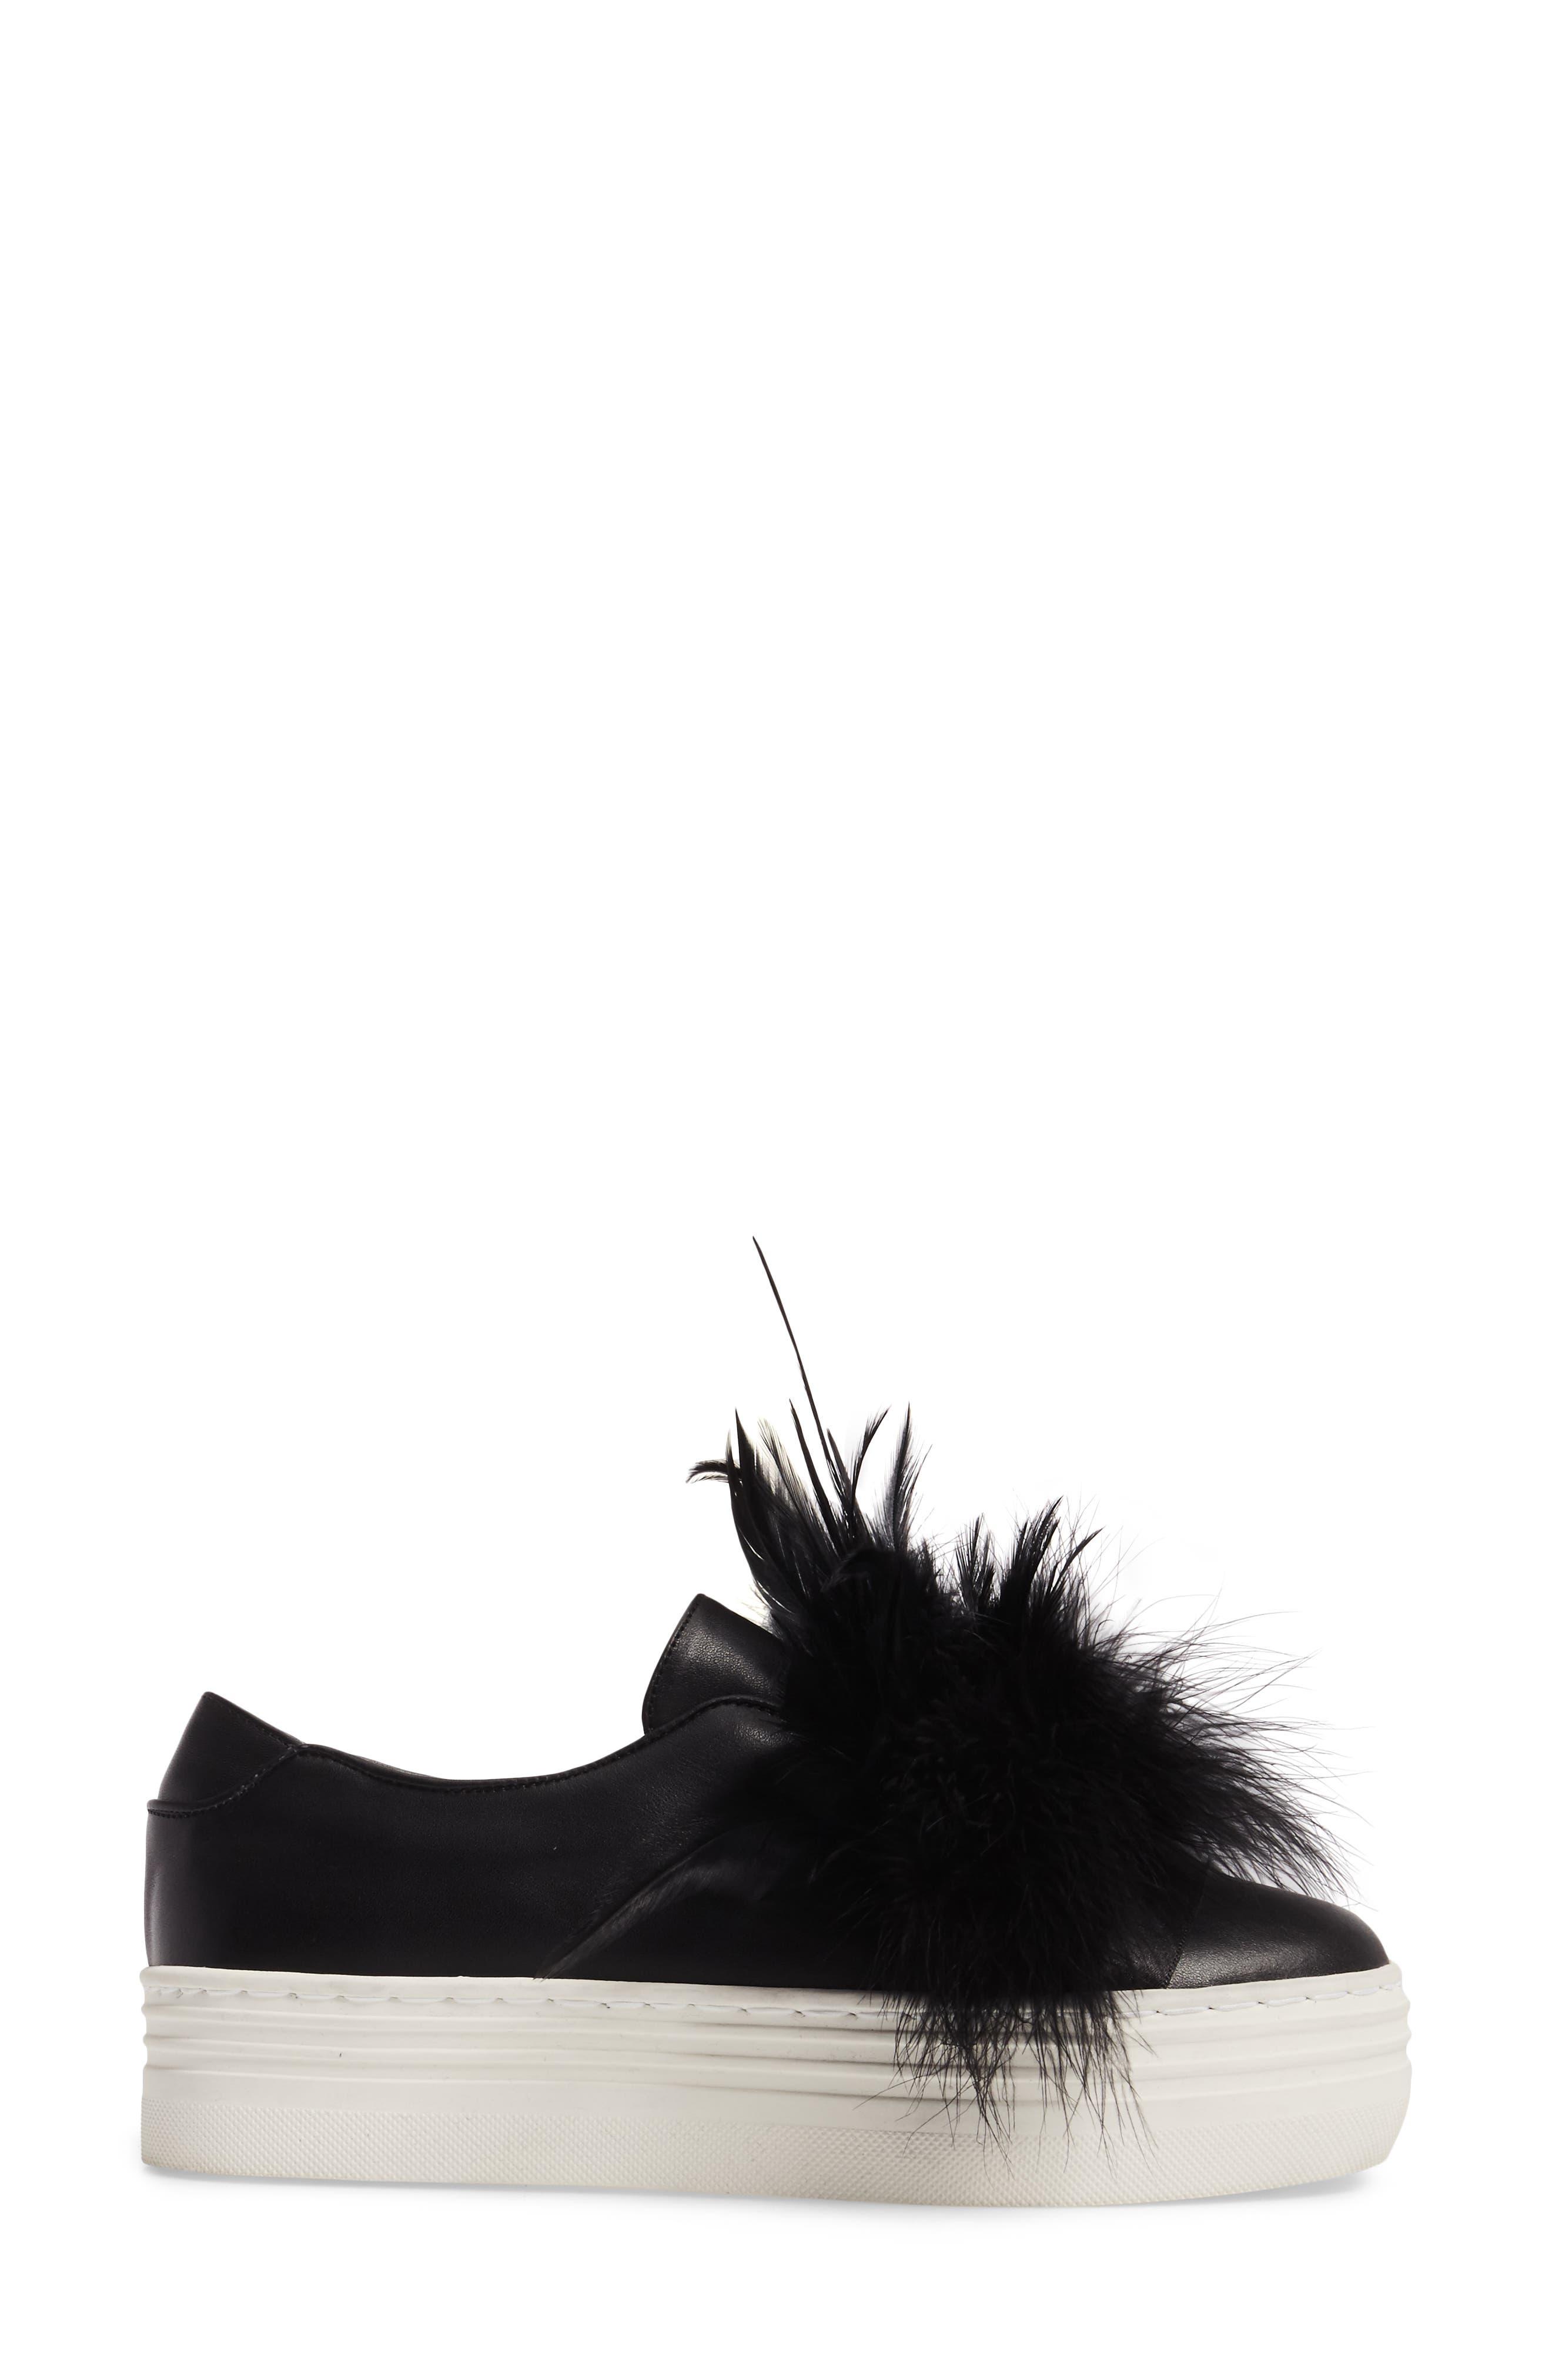 Lily Feather Pom Slip-On Platform Sneaker,                             Alternate thumbnail 3, color,                             001